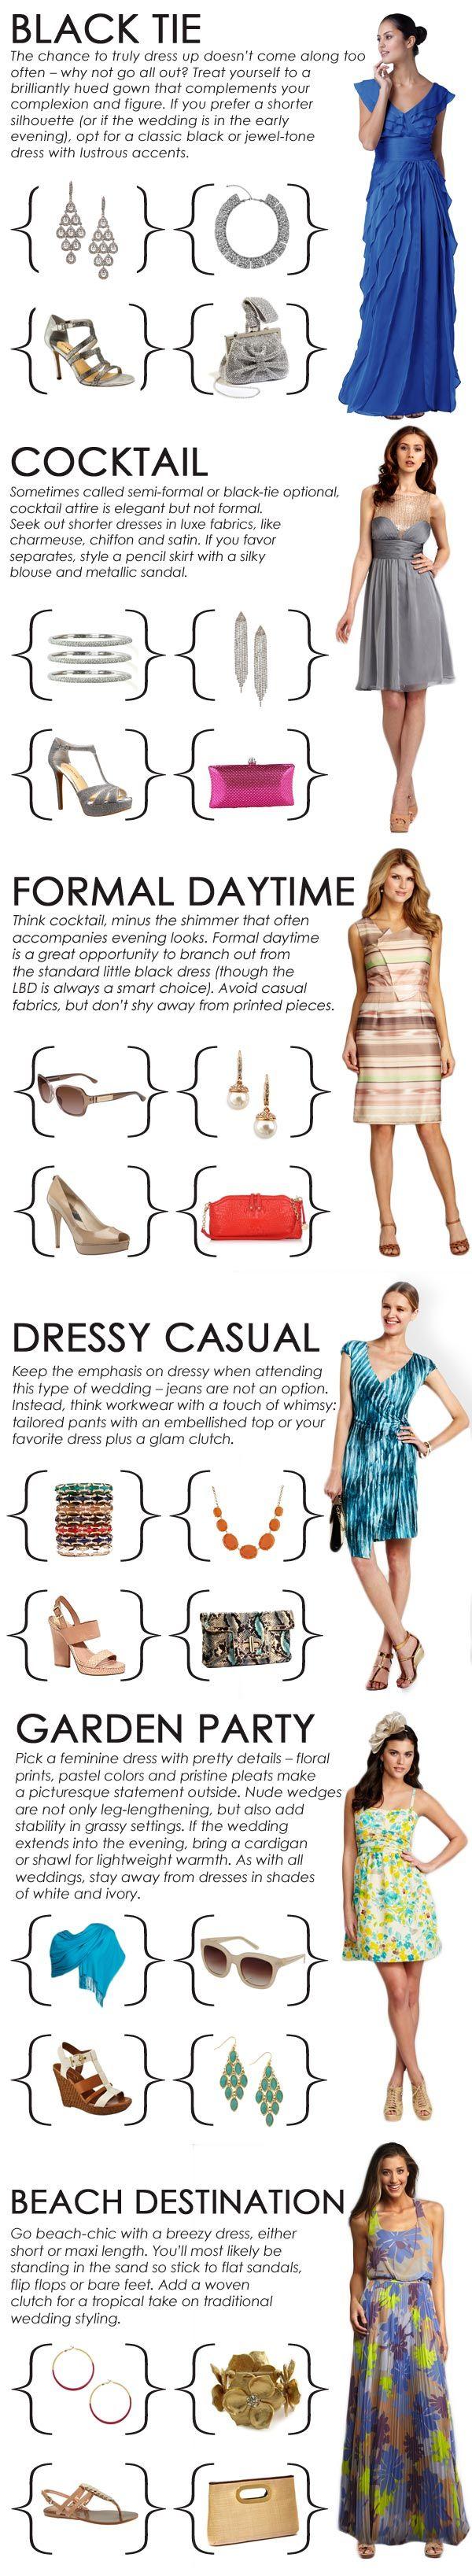 Wedding Decoding The Dress Code